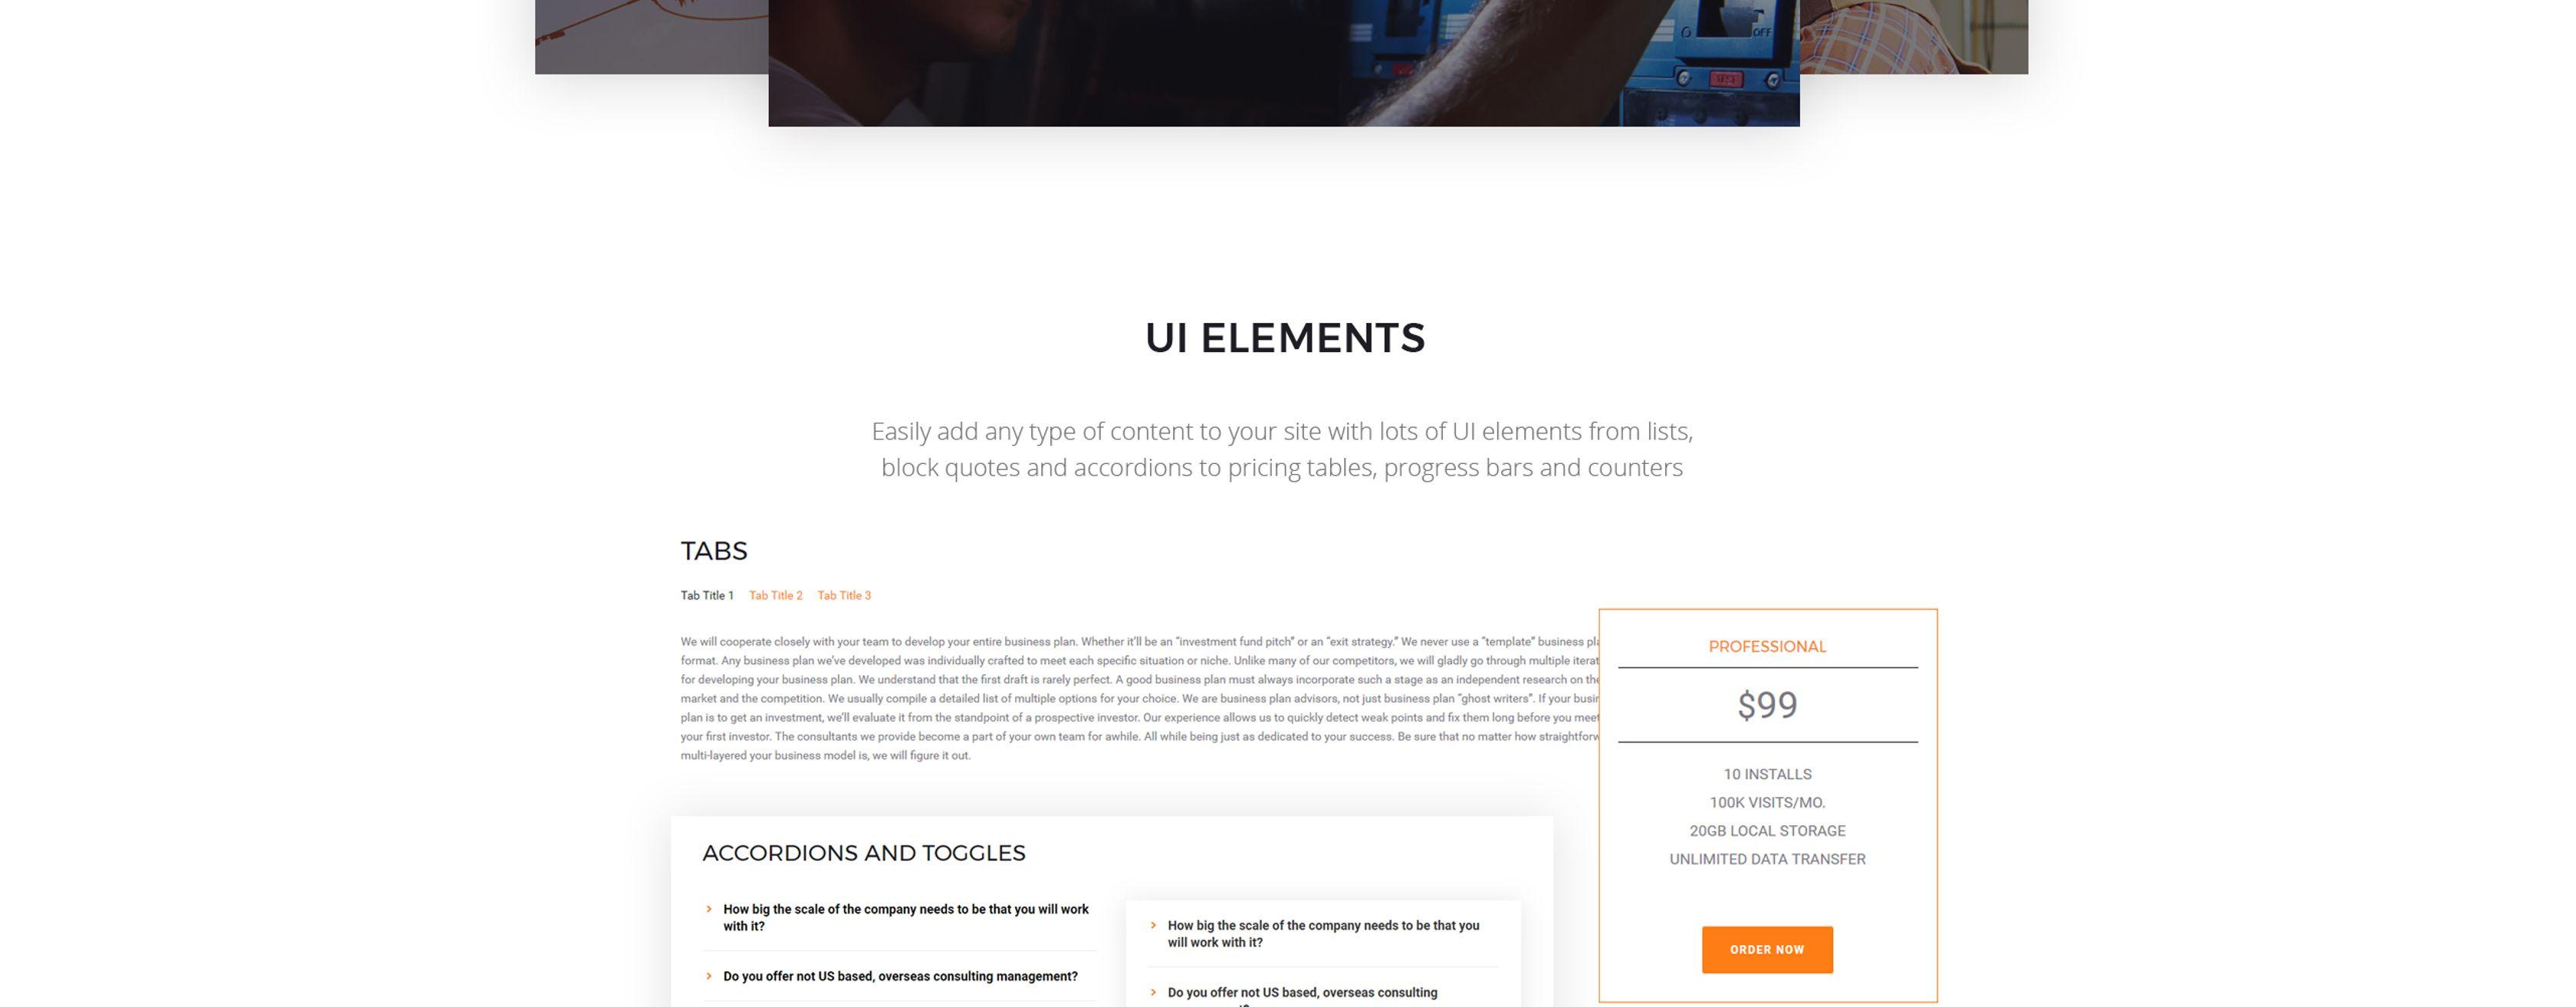 DigitalDIGGER - Electrical Services Joomla Template